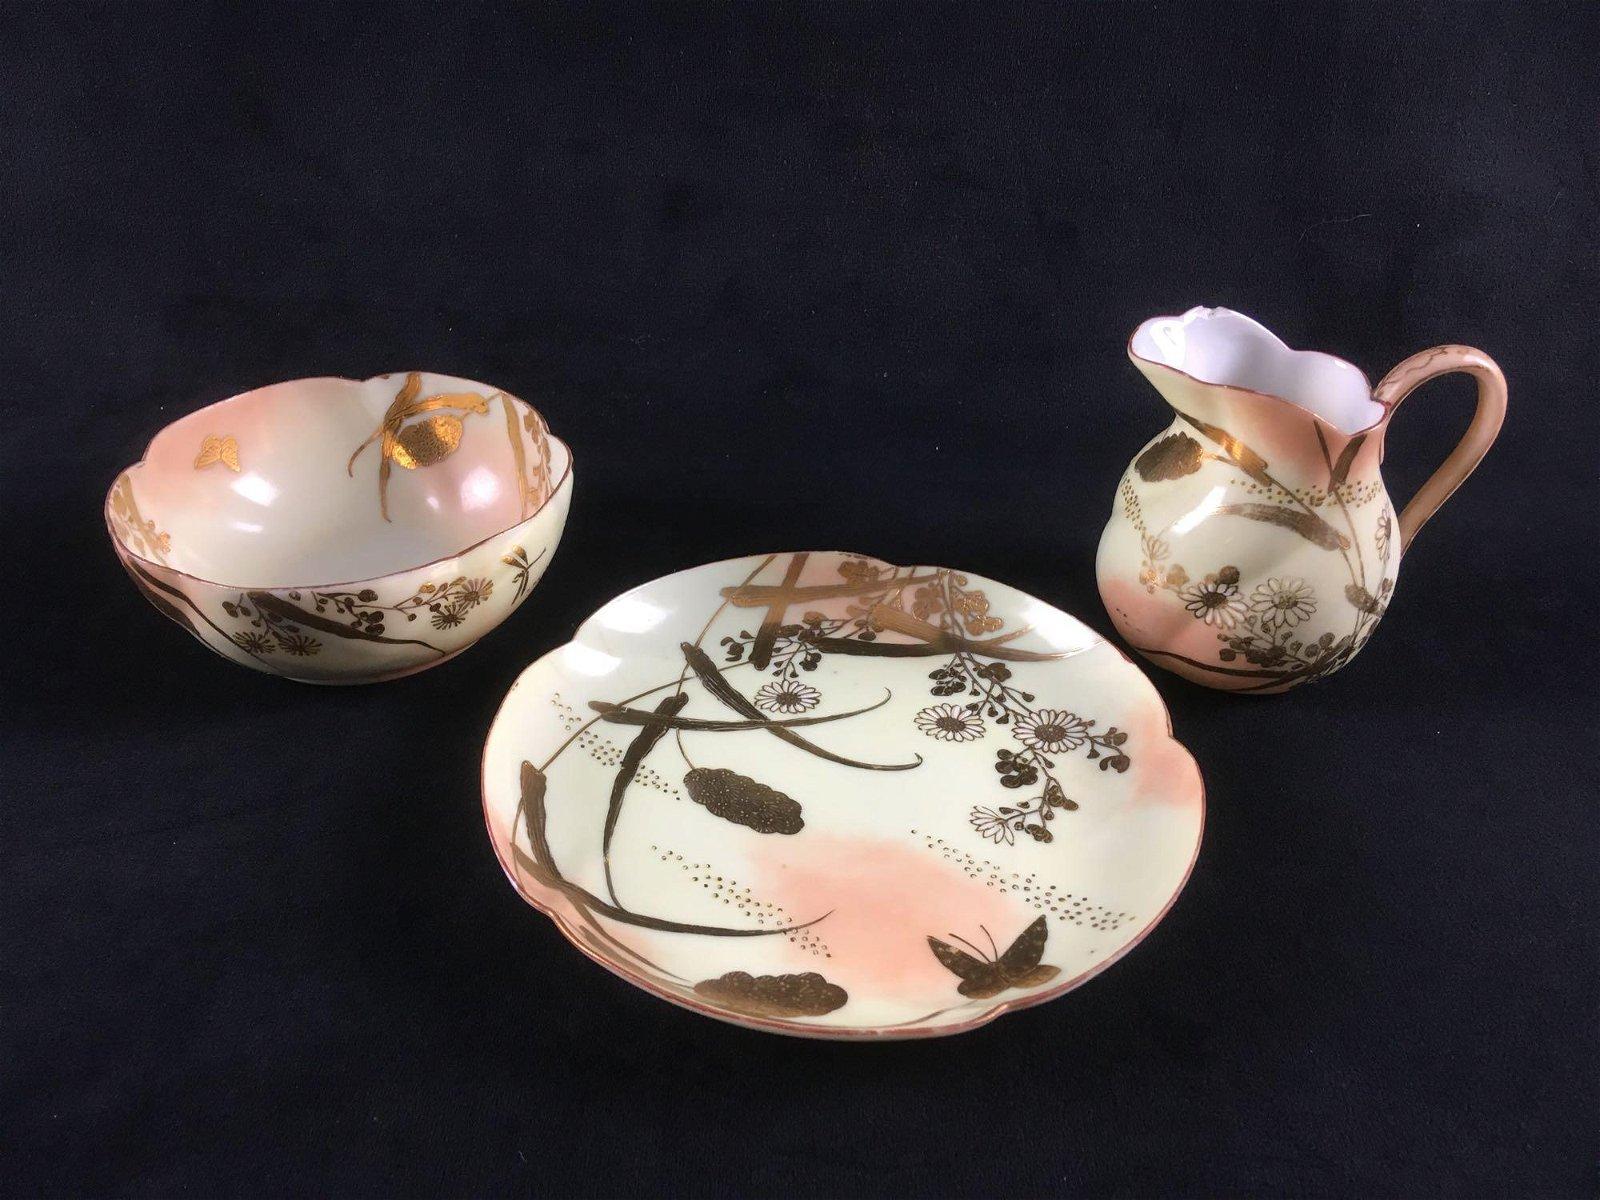 Mid Century Modern Porcelain Dessert Set 3 Pieces